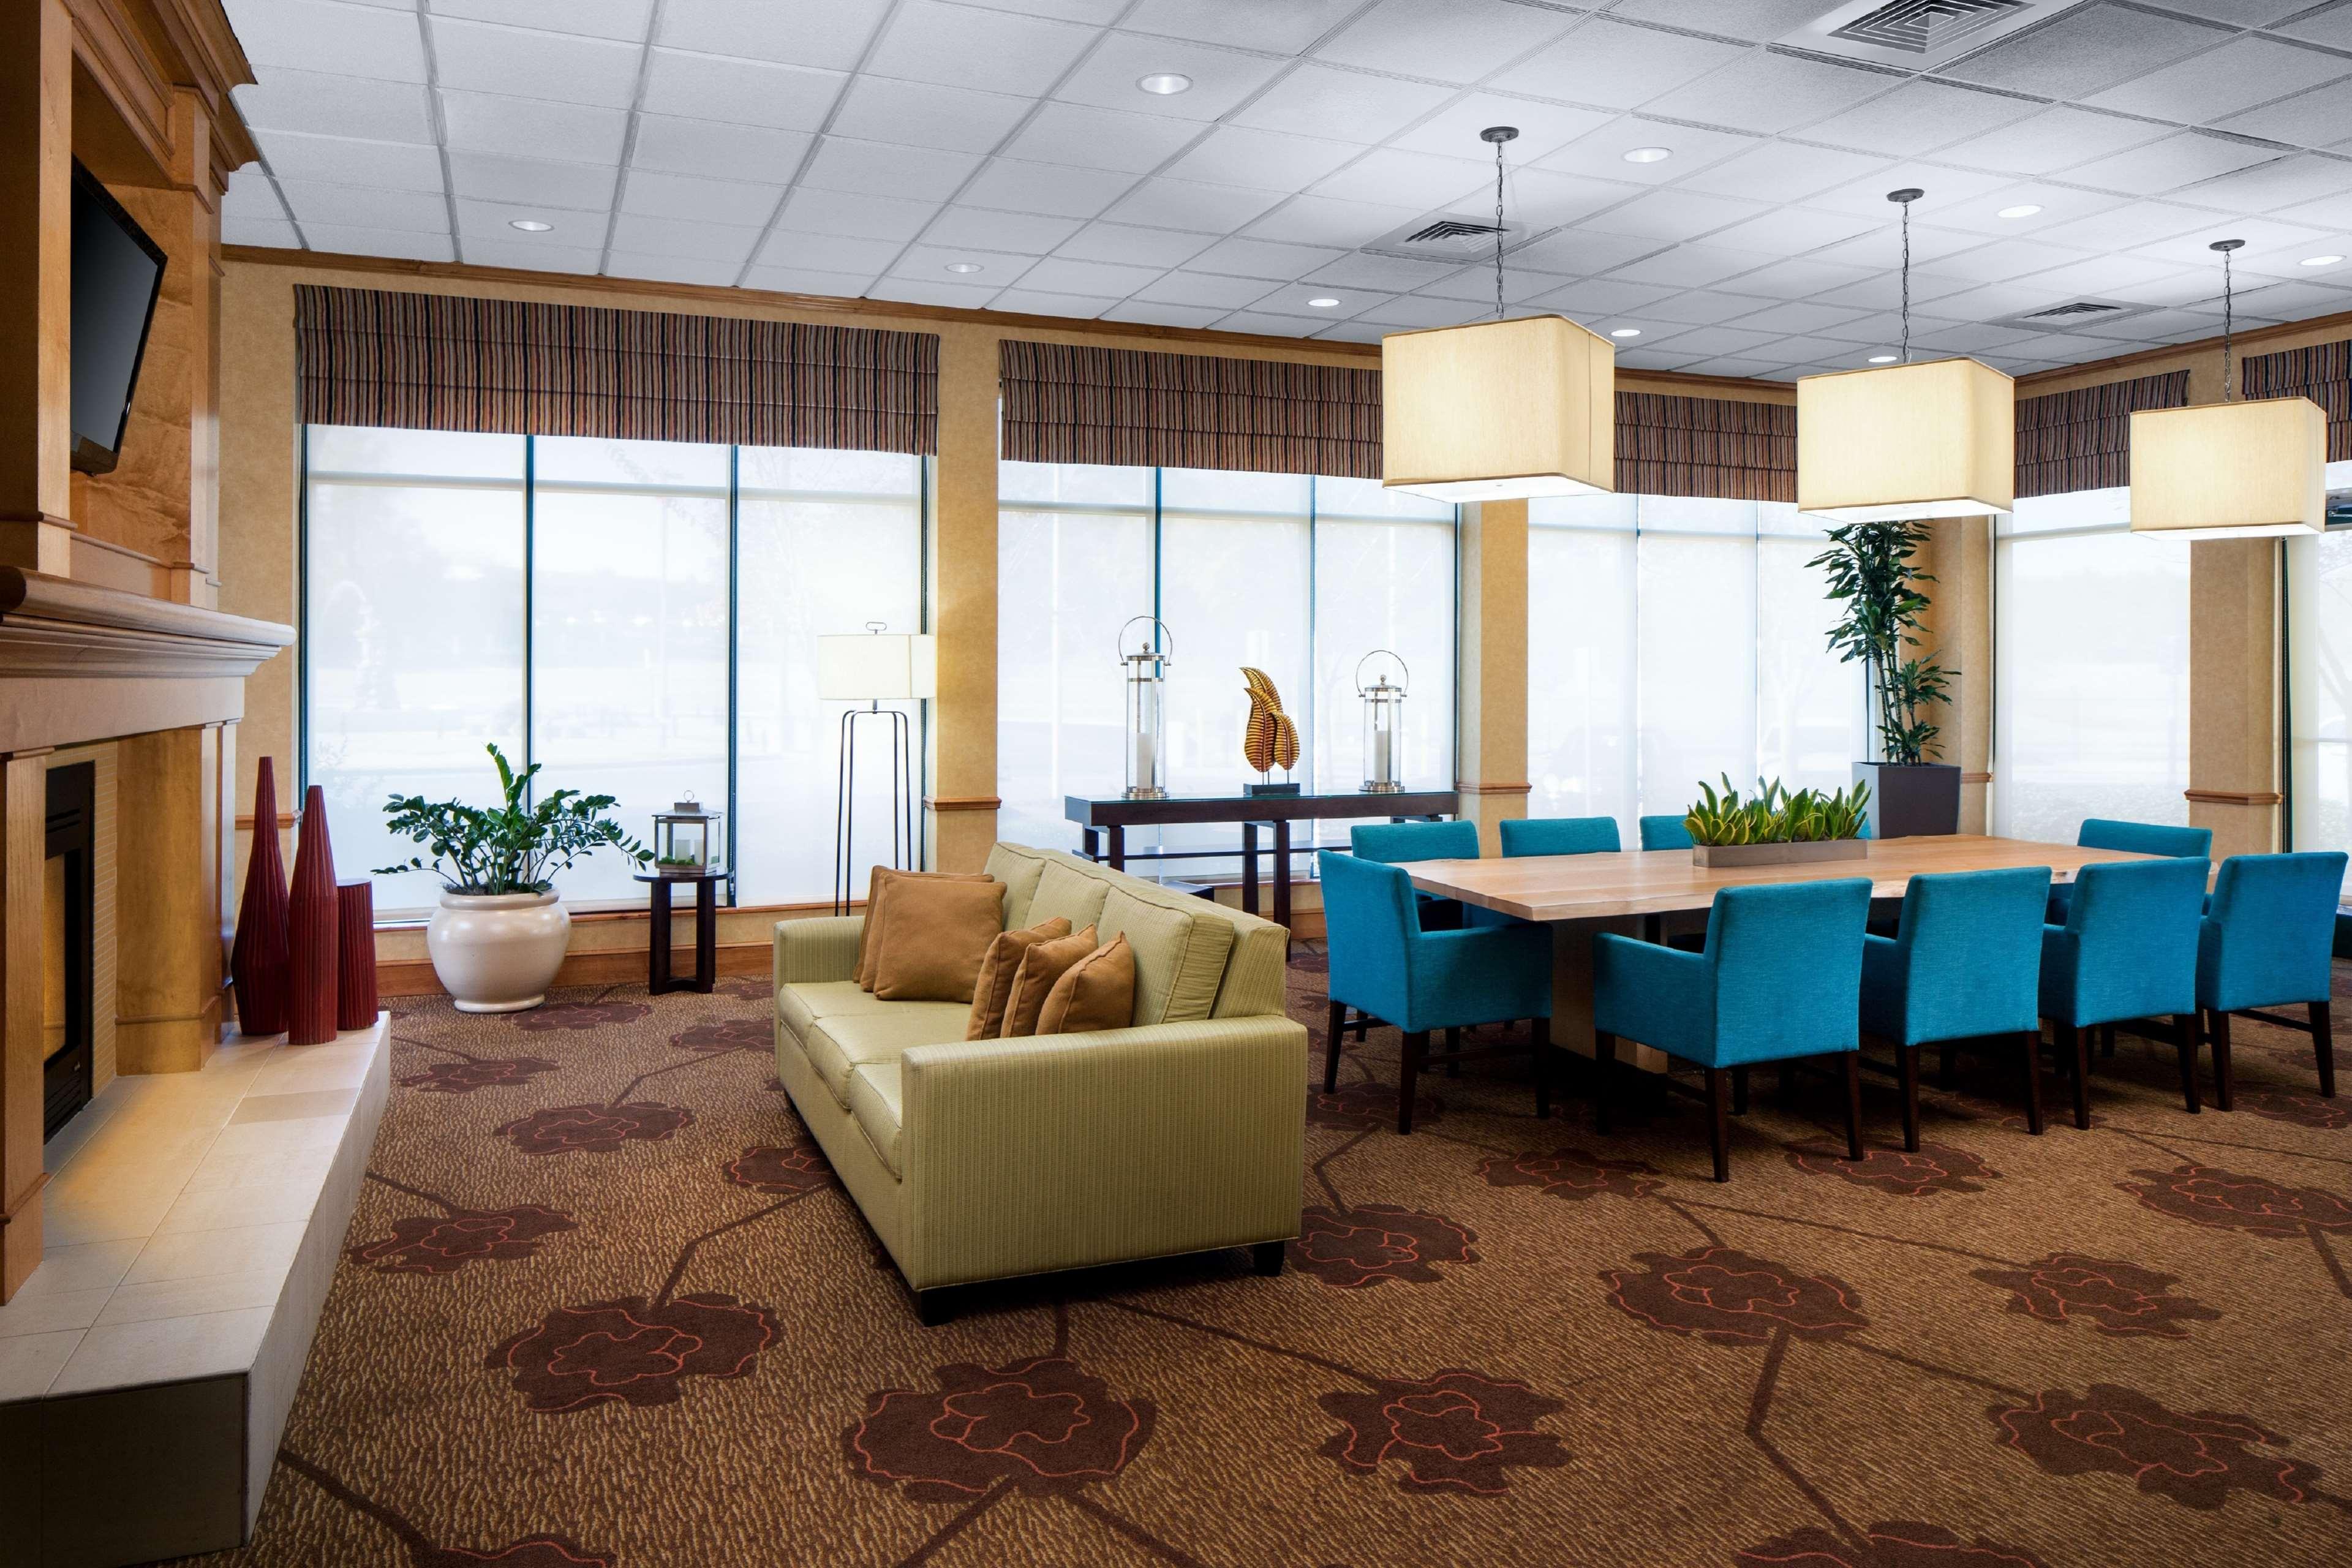 Hilton Garden Inn Atlanta Airport/Millenium Center image 4